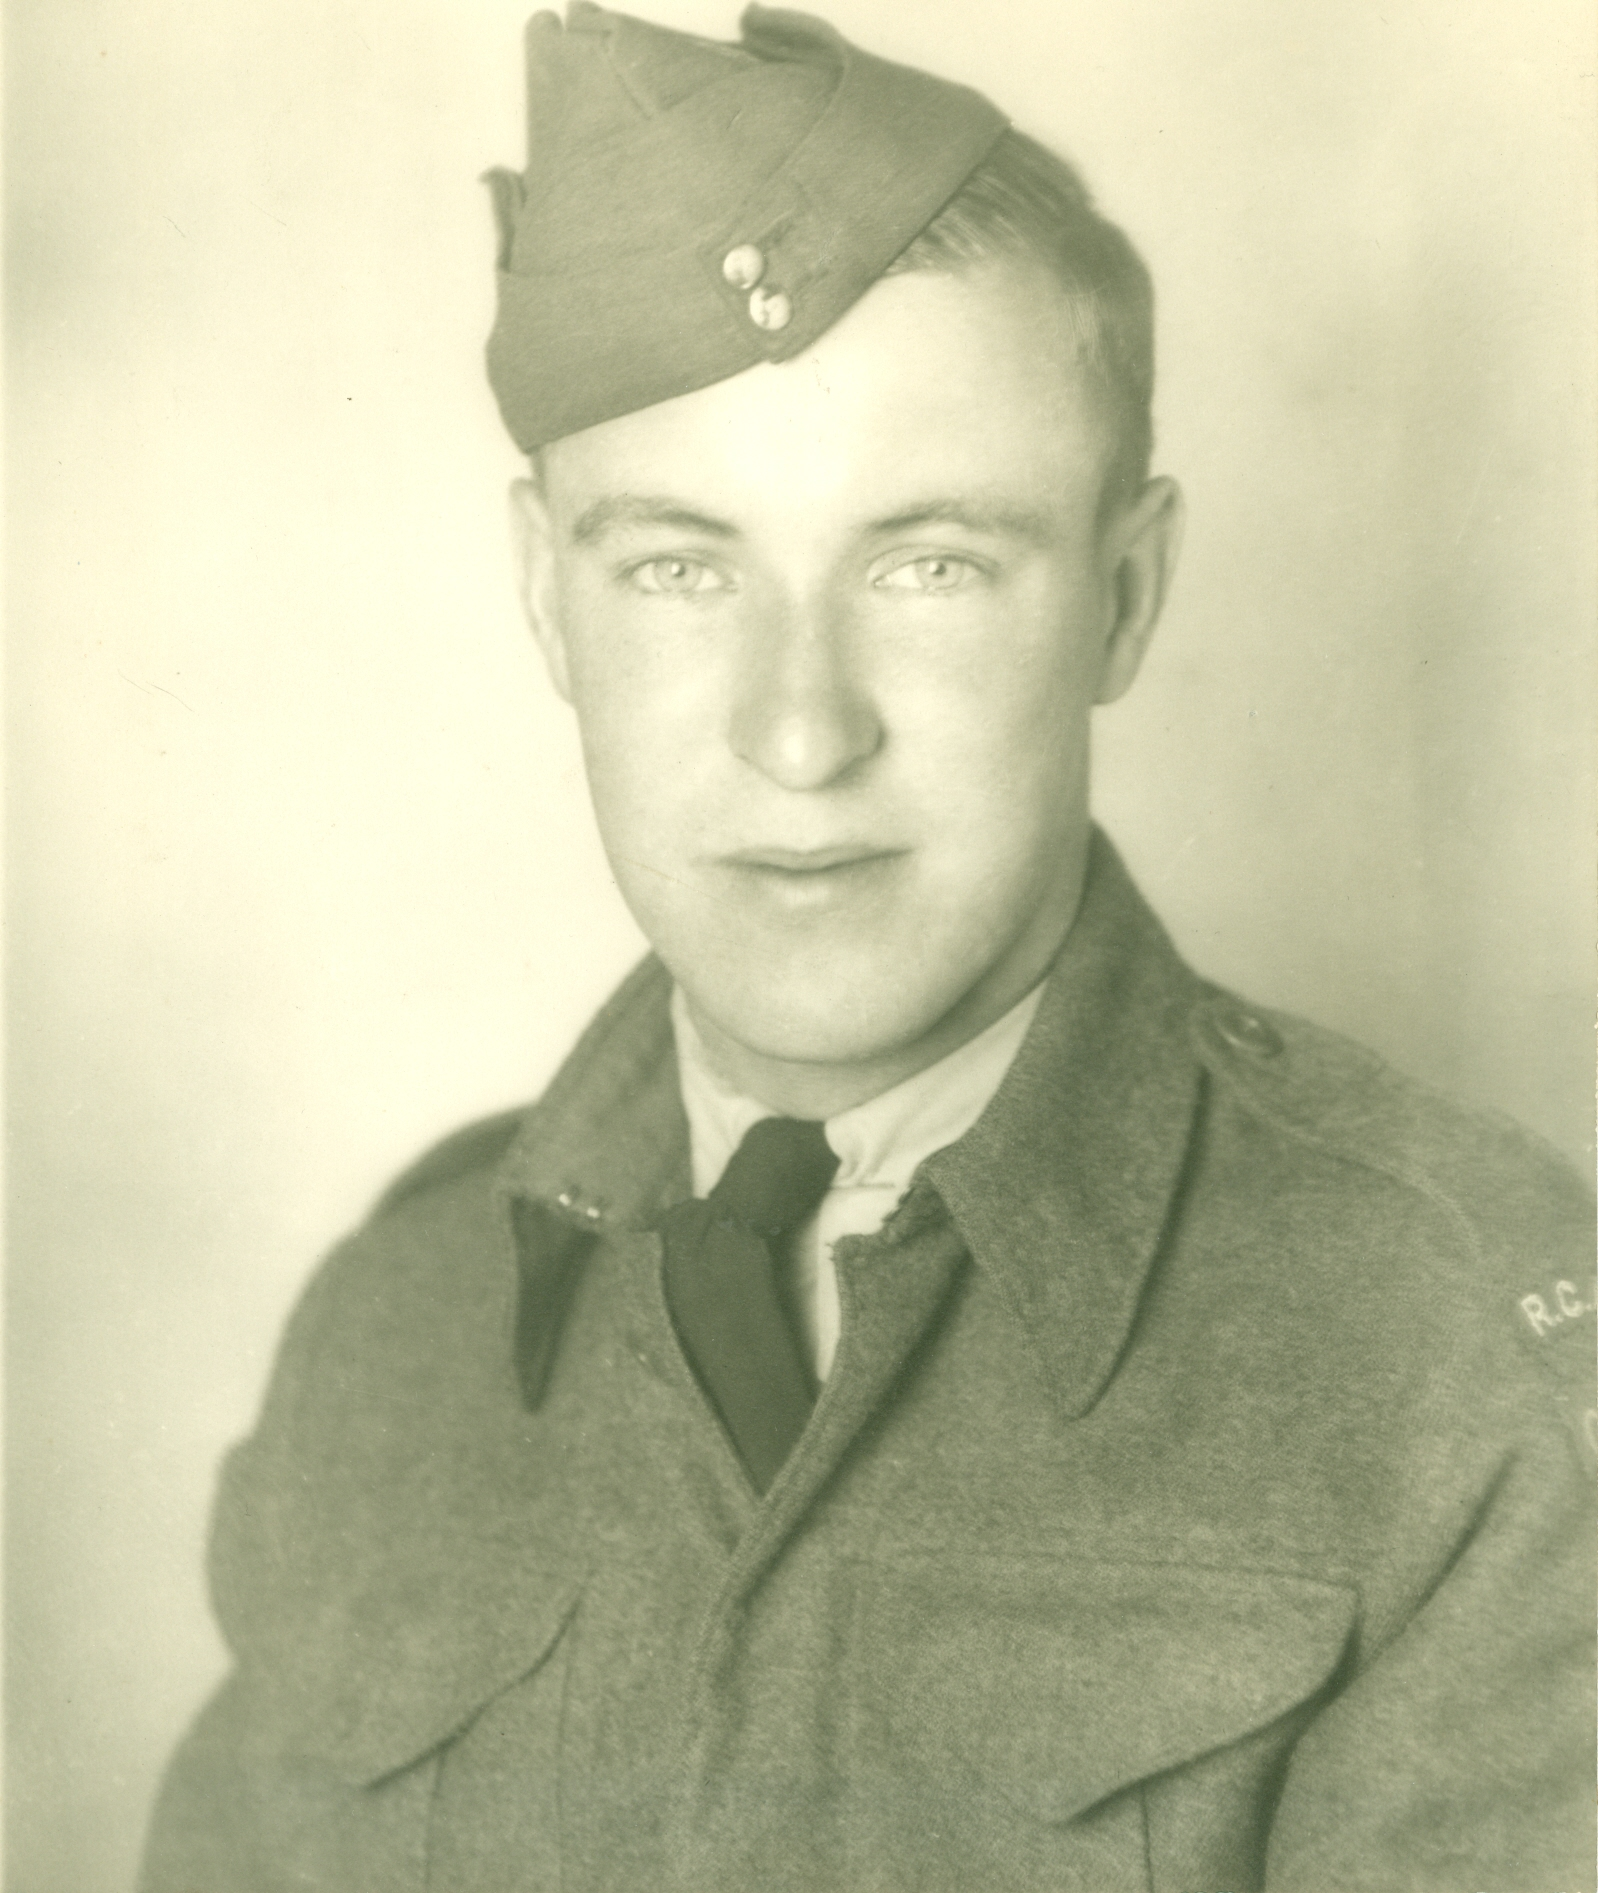 Photo of Thomas Irvine Earle